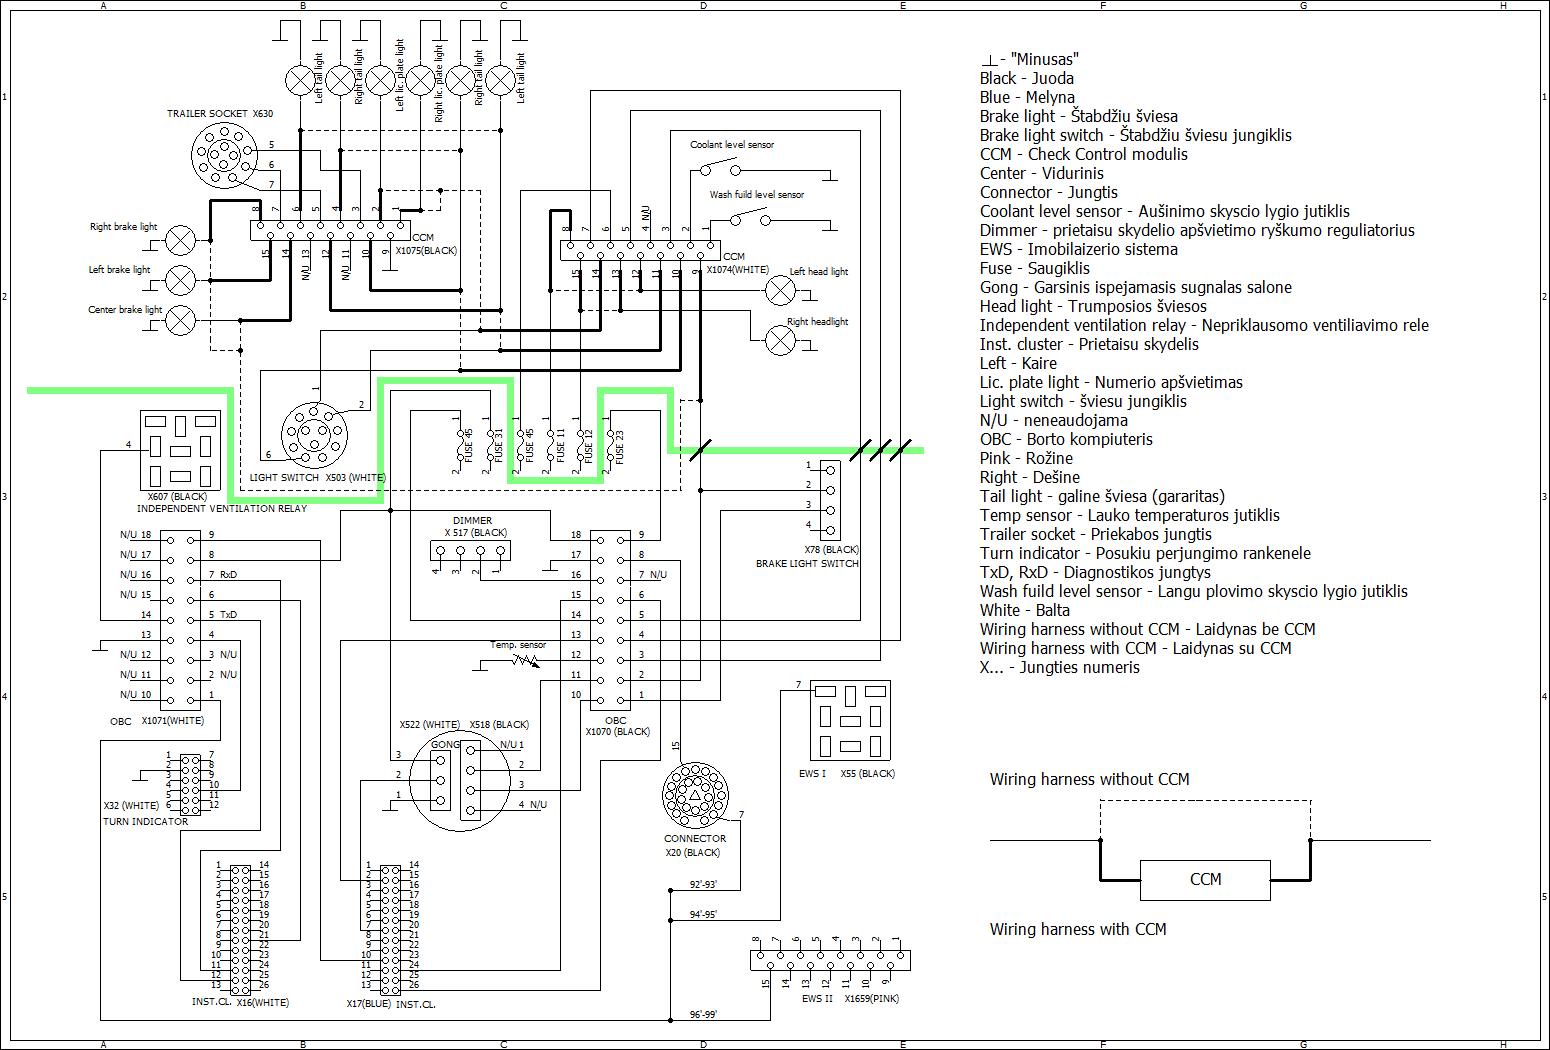 bmw e36 7 button obc wiring diagram